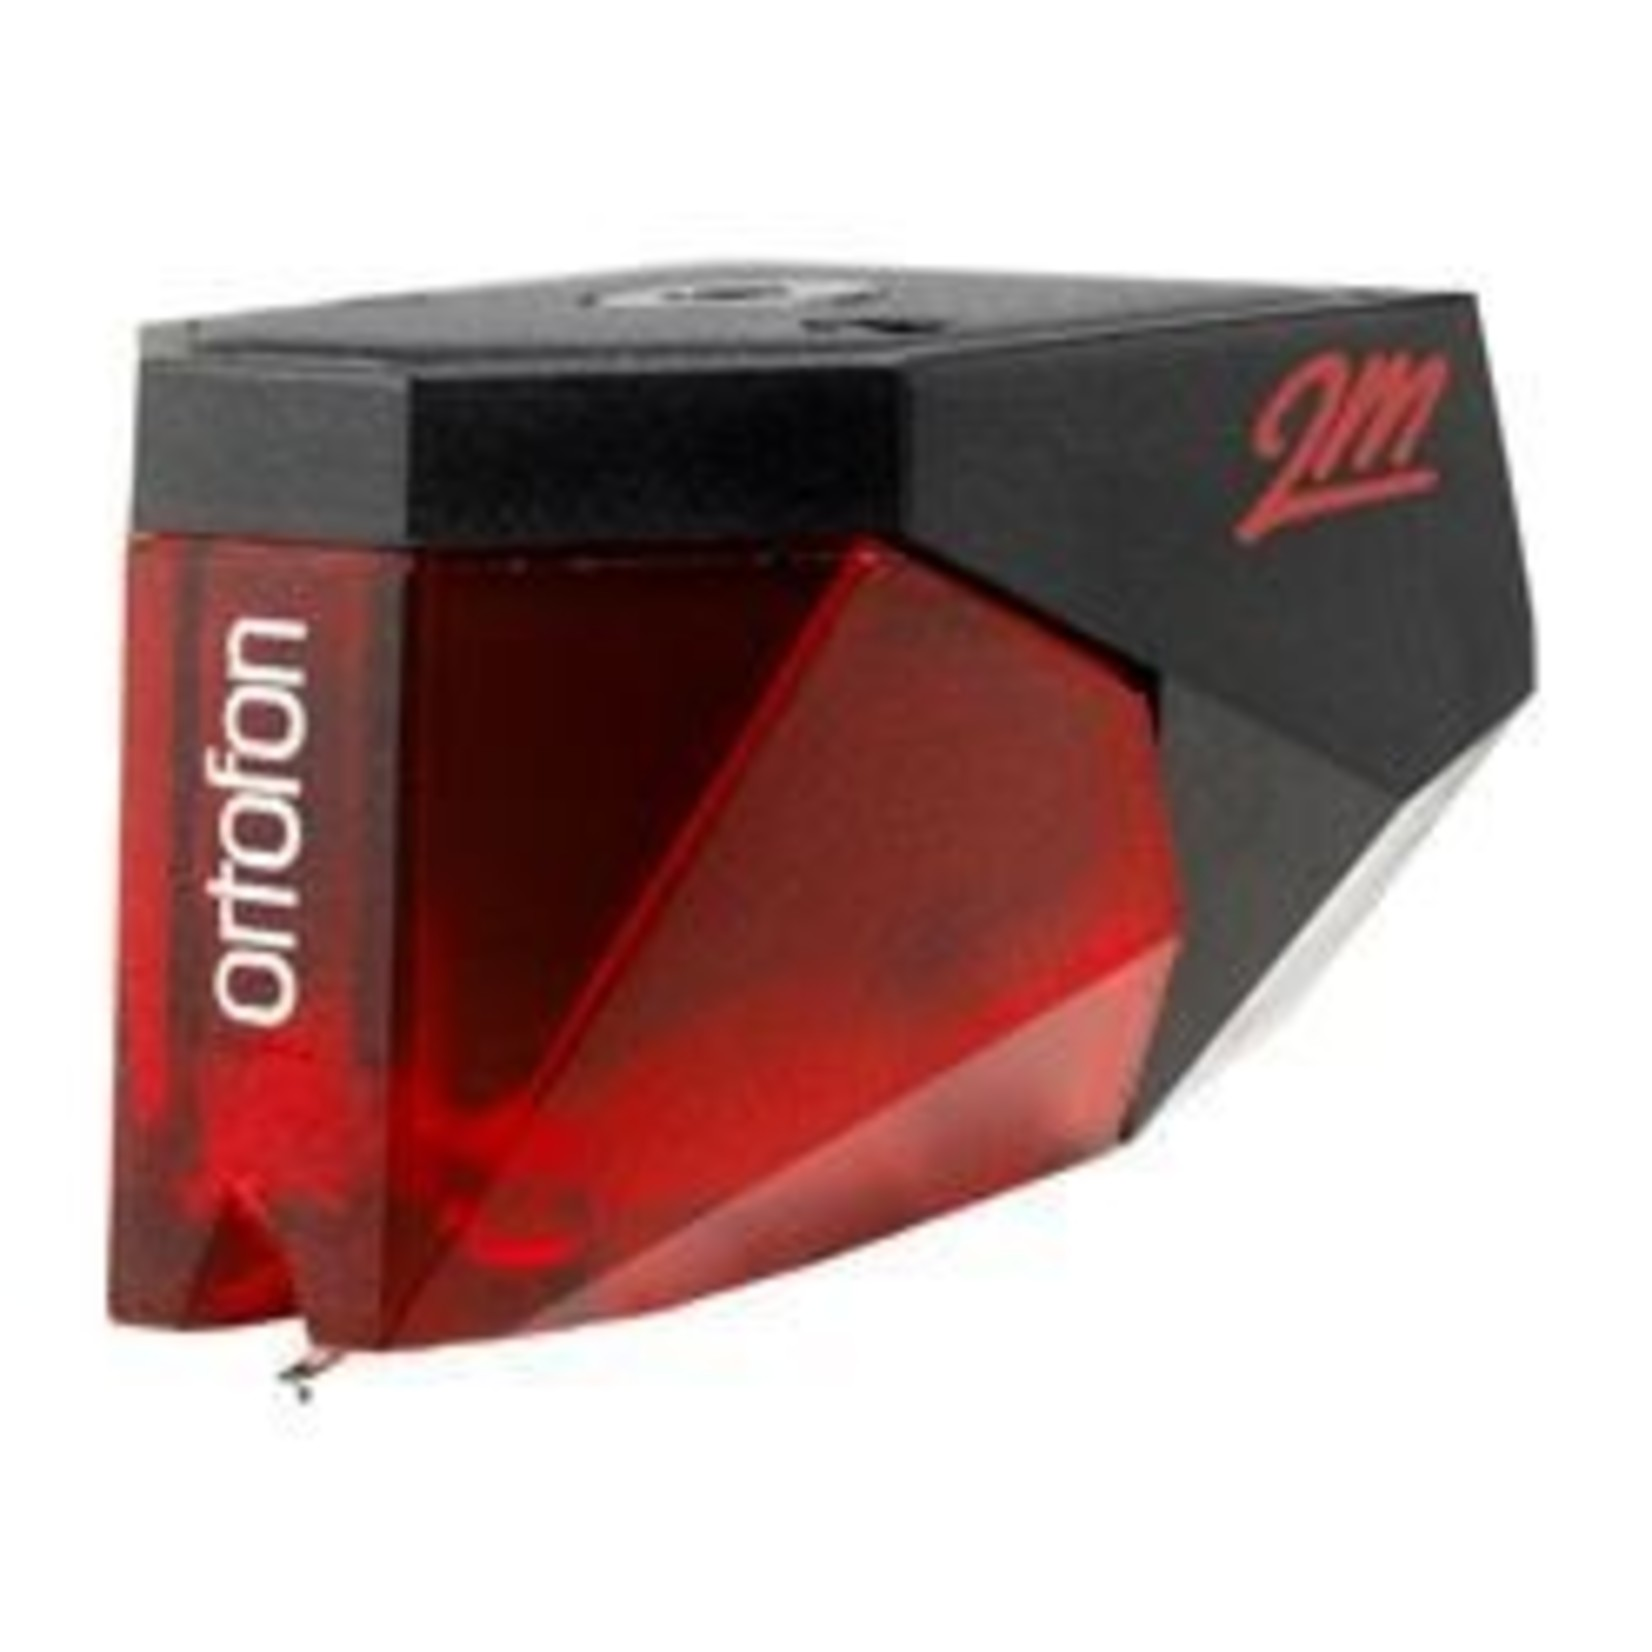 Accessory Ortofon 2M RED Cartridge